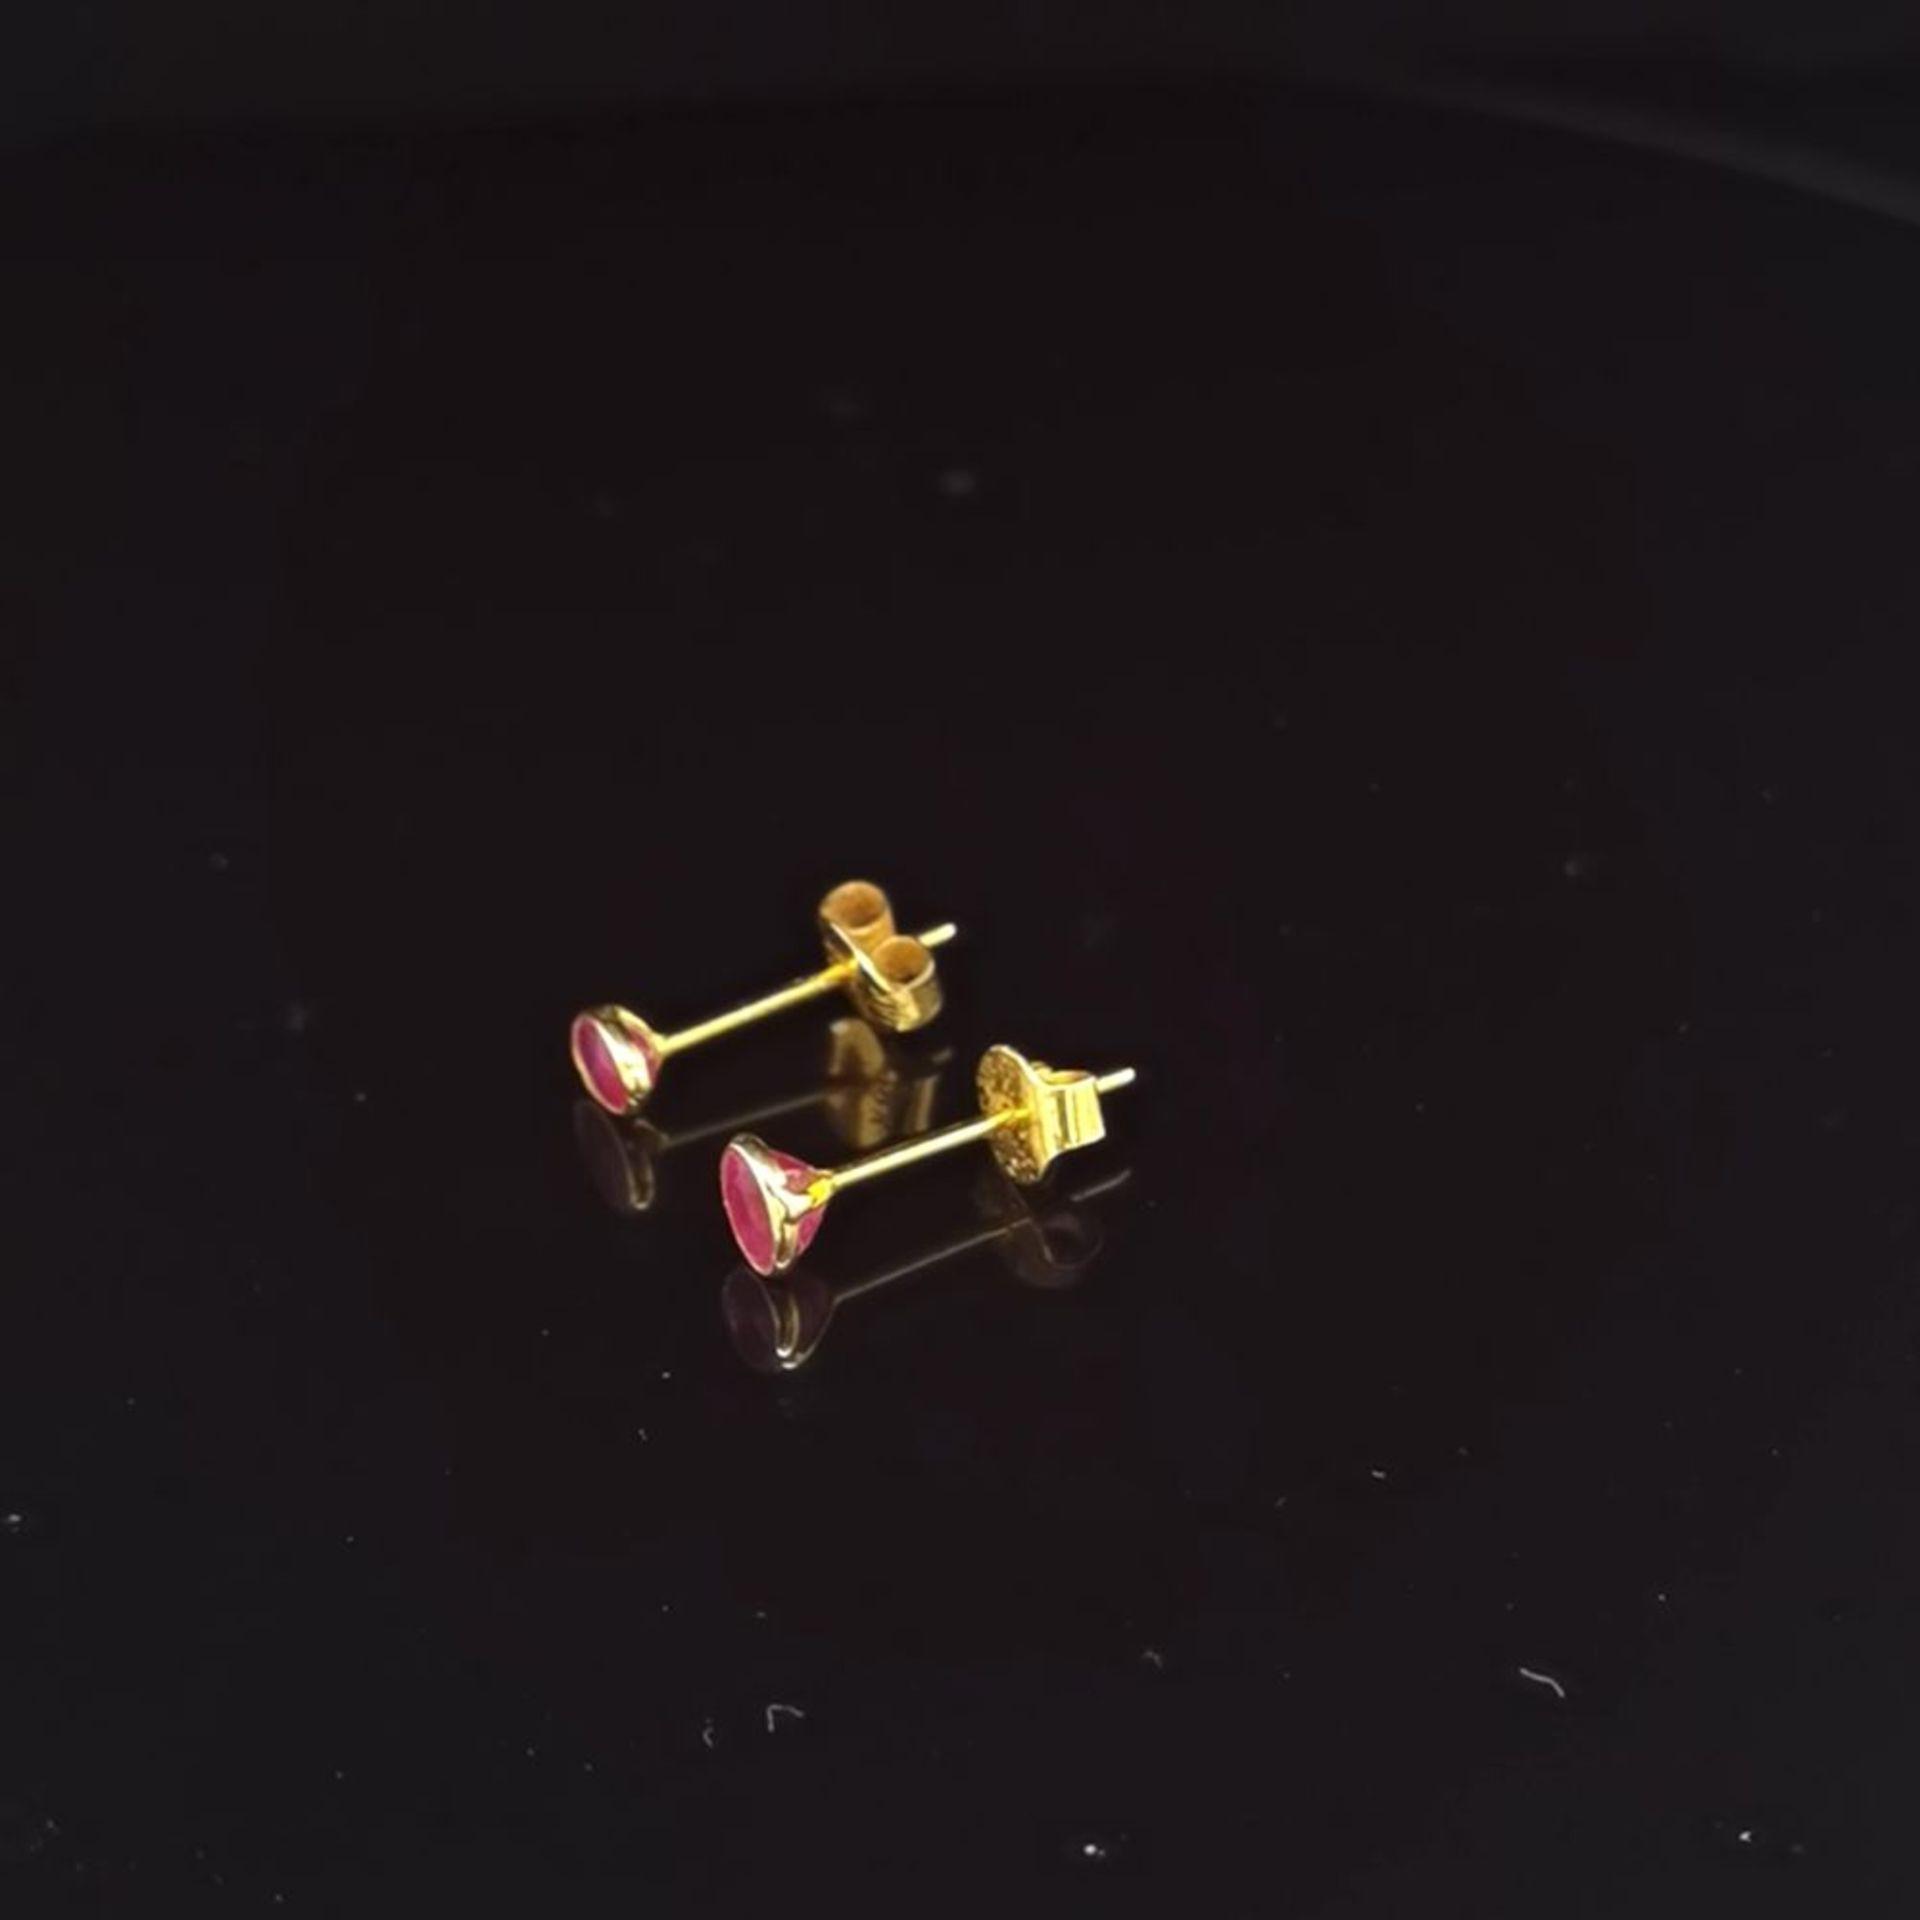 Rubin-Ohrstecker, 750 Gold 0,7 - Image 2 of 3